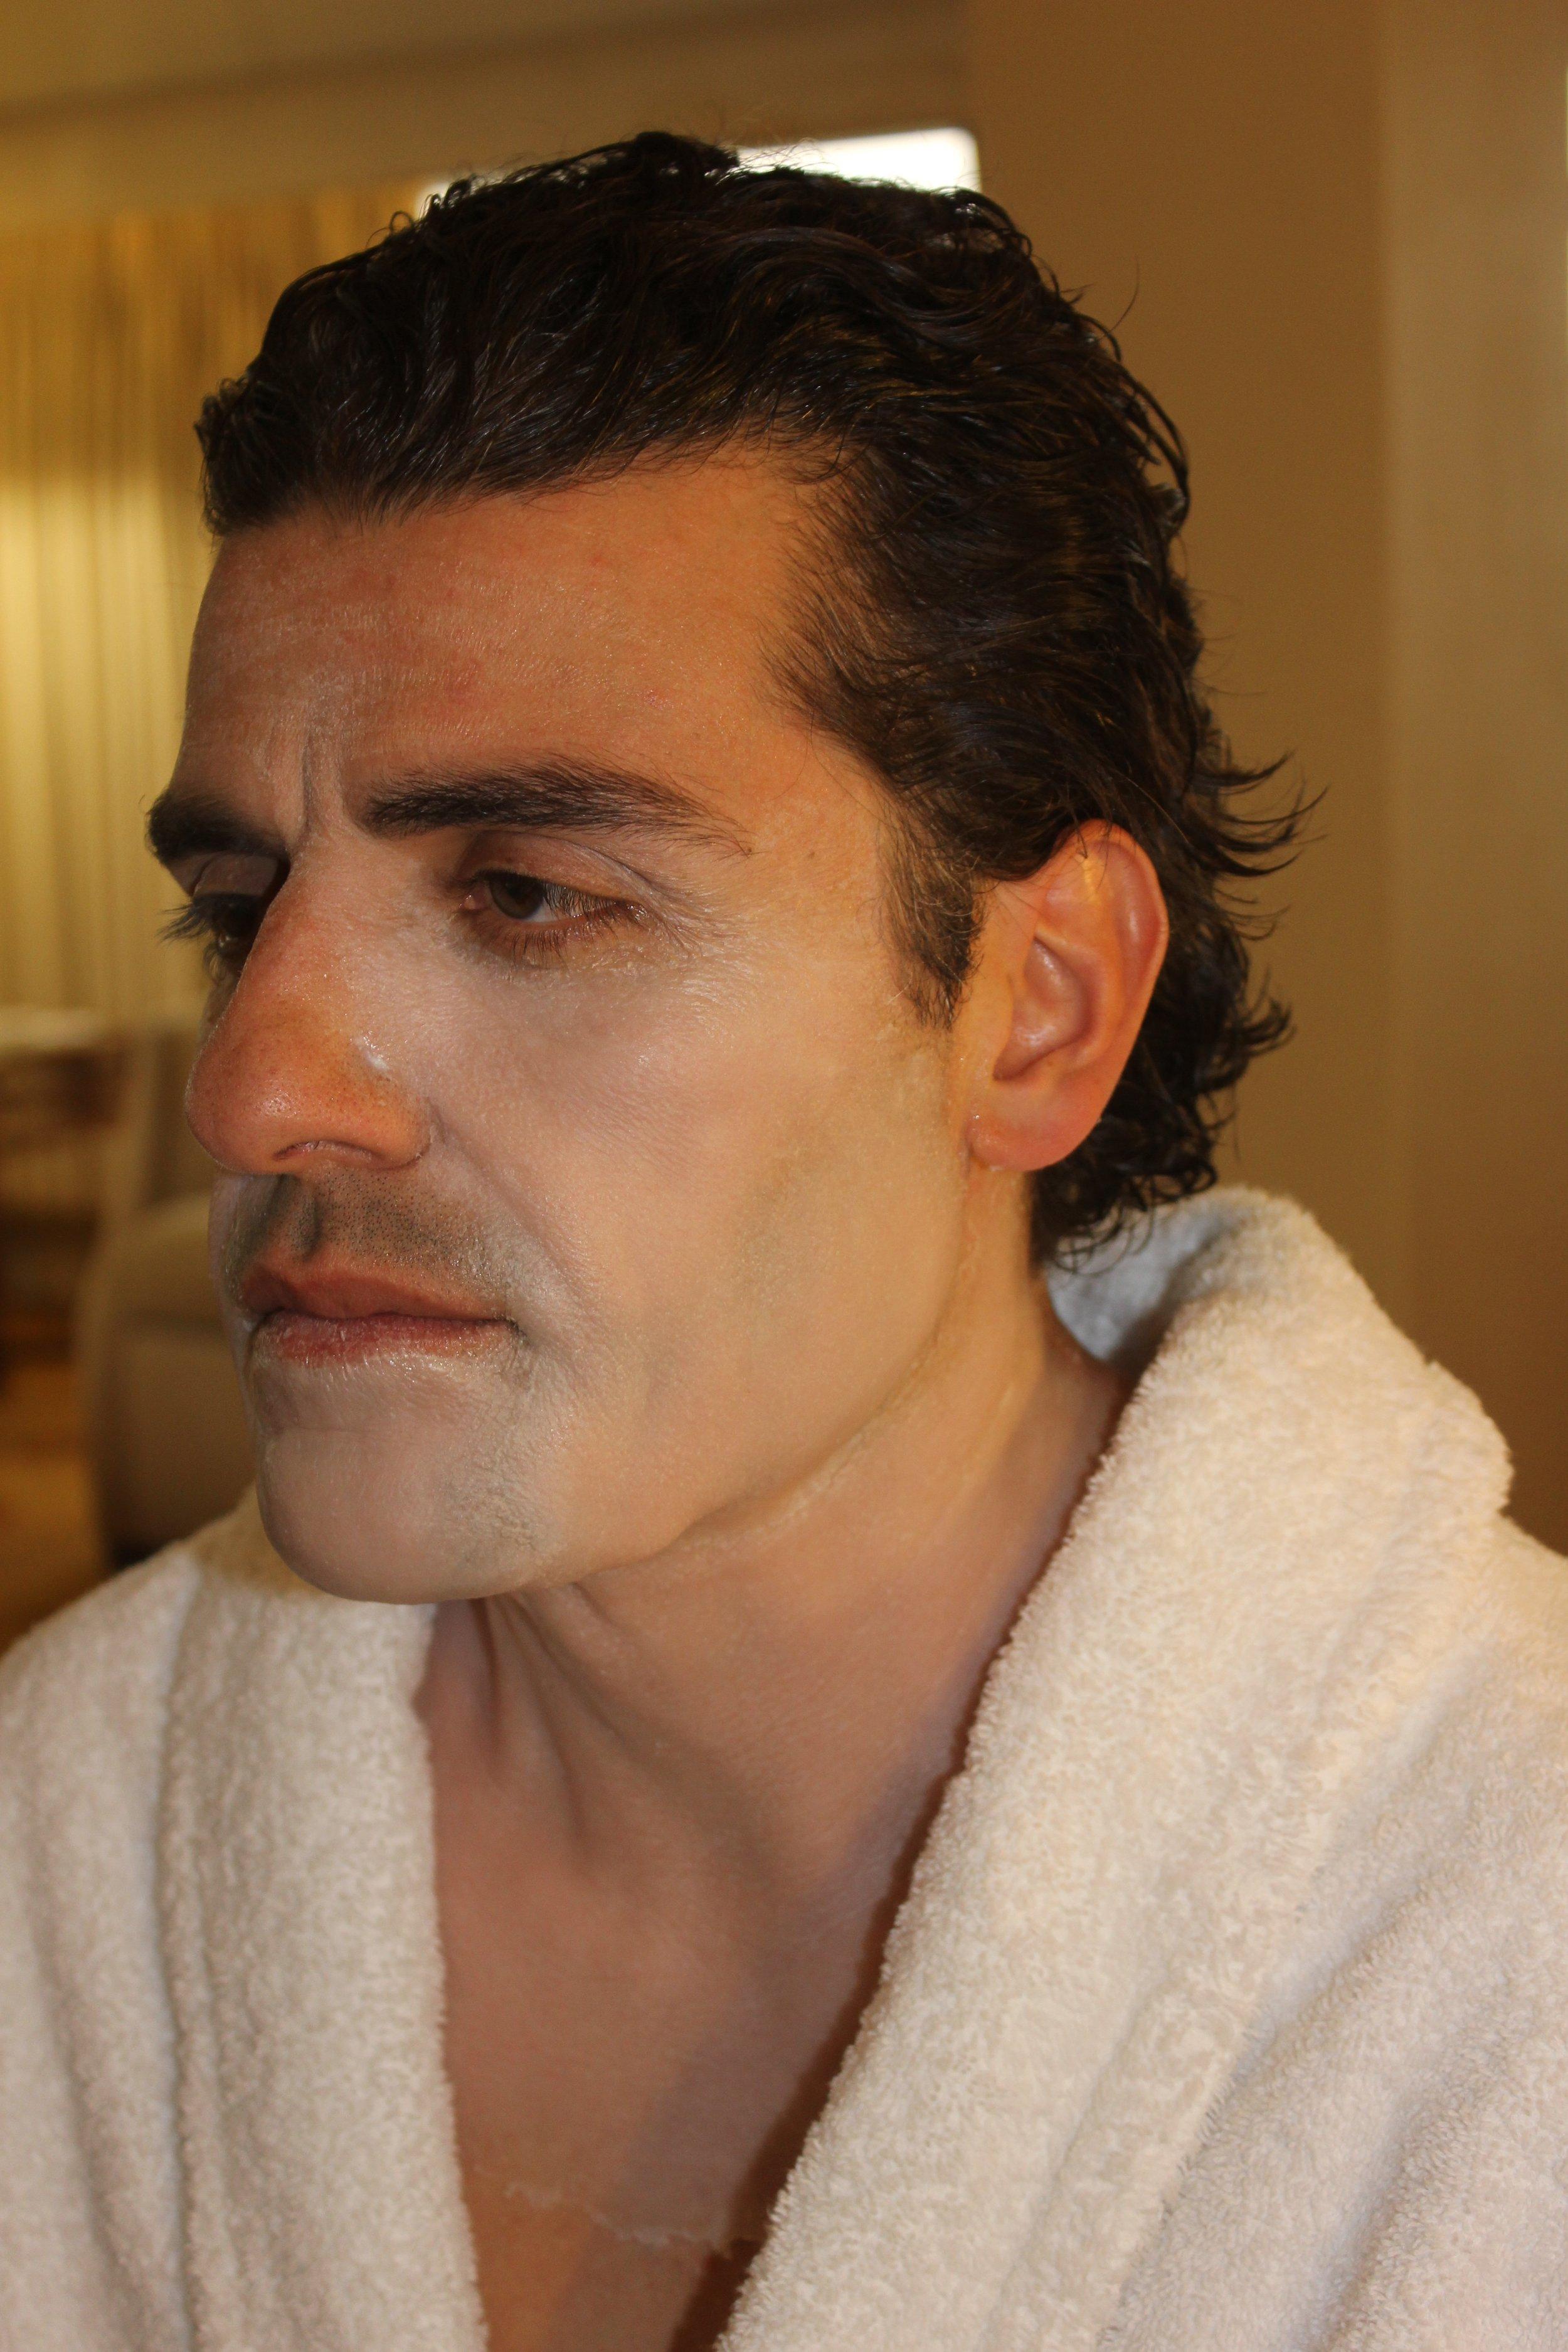 Oscar Makeup in Mid Process 05.jpg